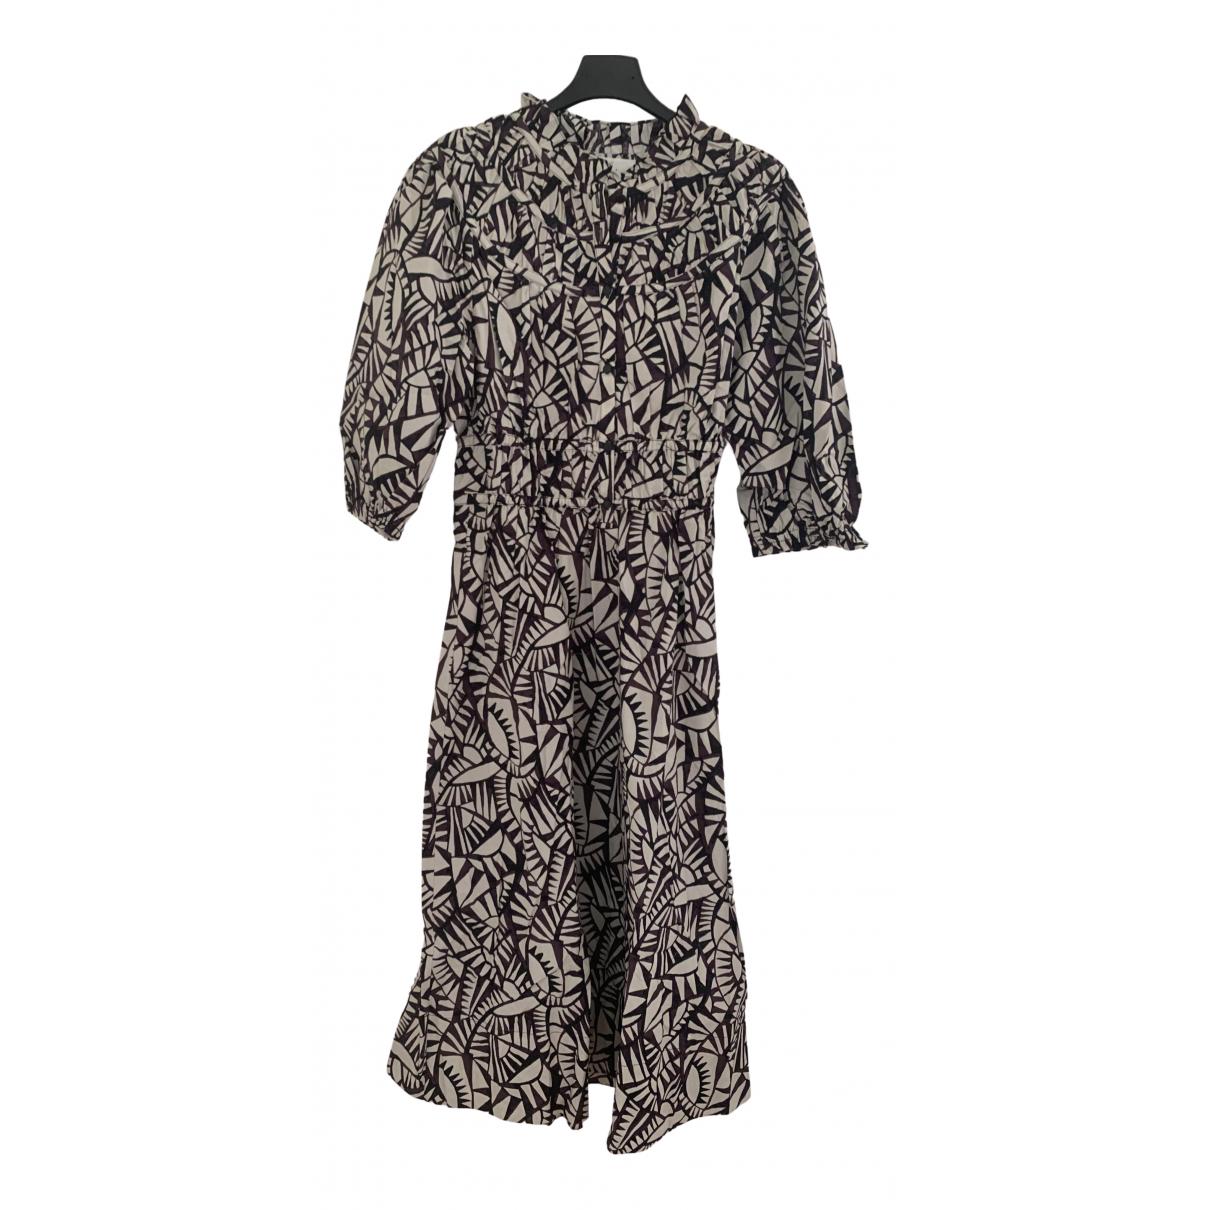 Ba&sh N Cotton dress for Women 0 0-5